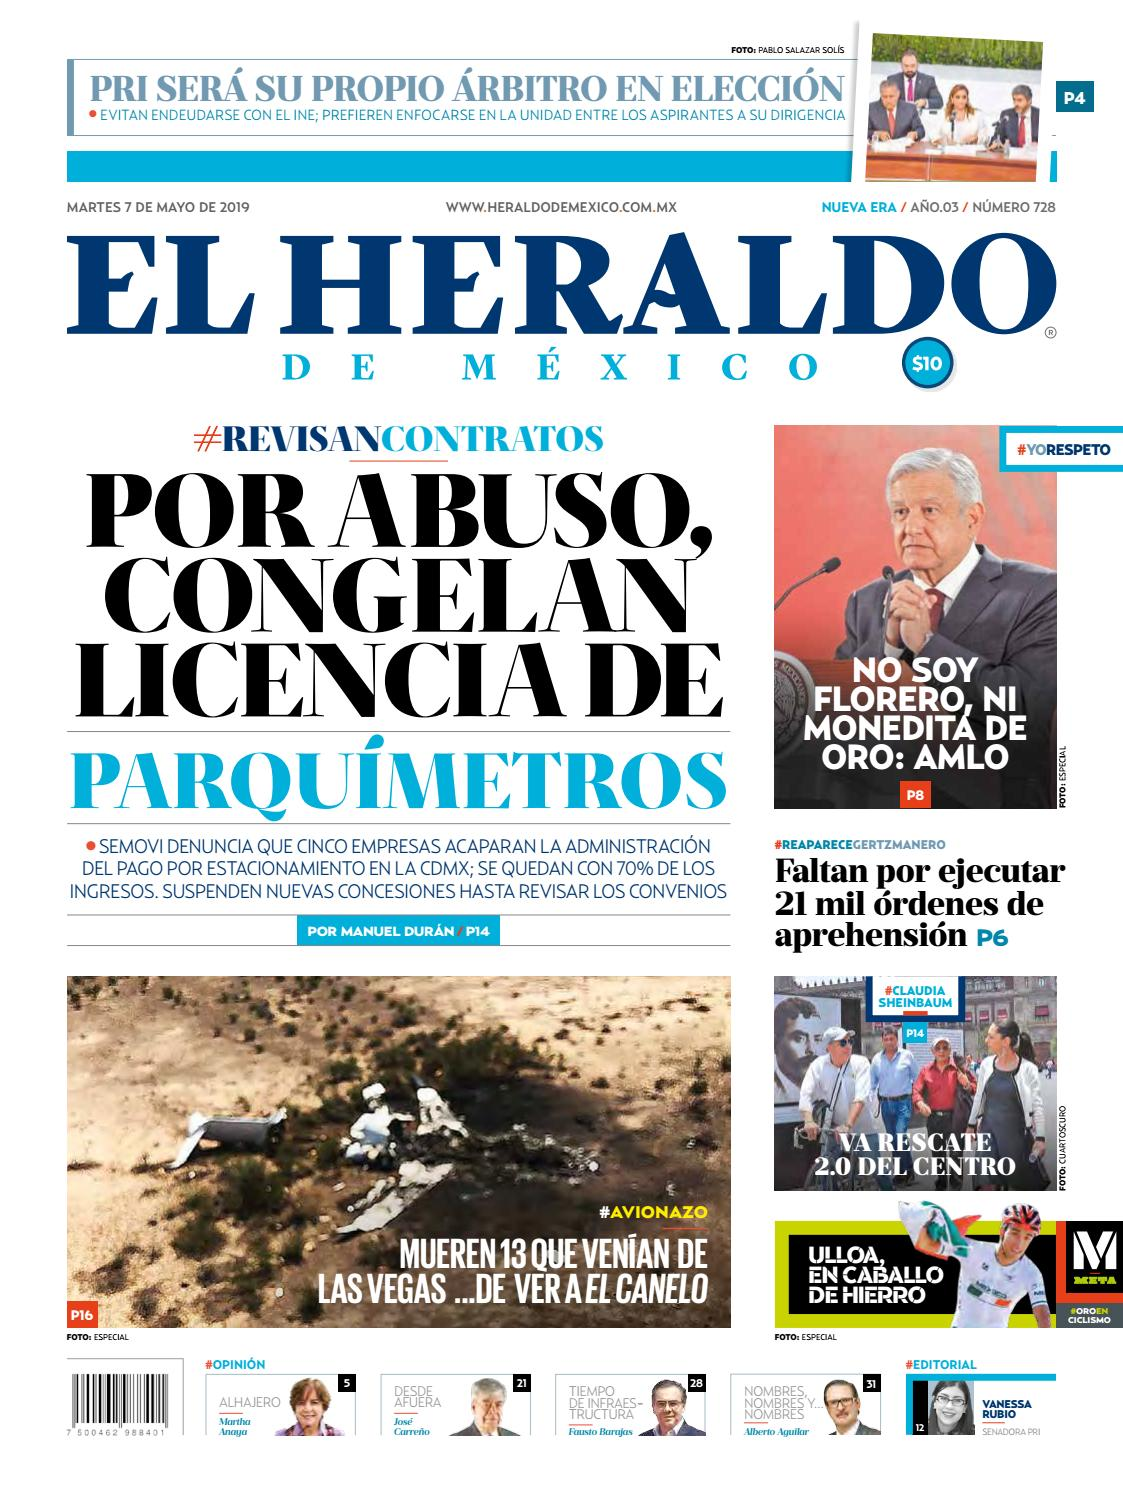 e1b7f171ff Martes 7 de mayo de 2019 by El Heraldo de México - issuu